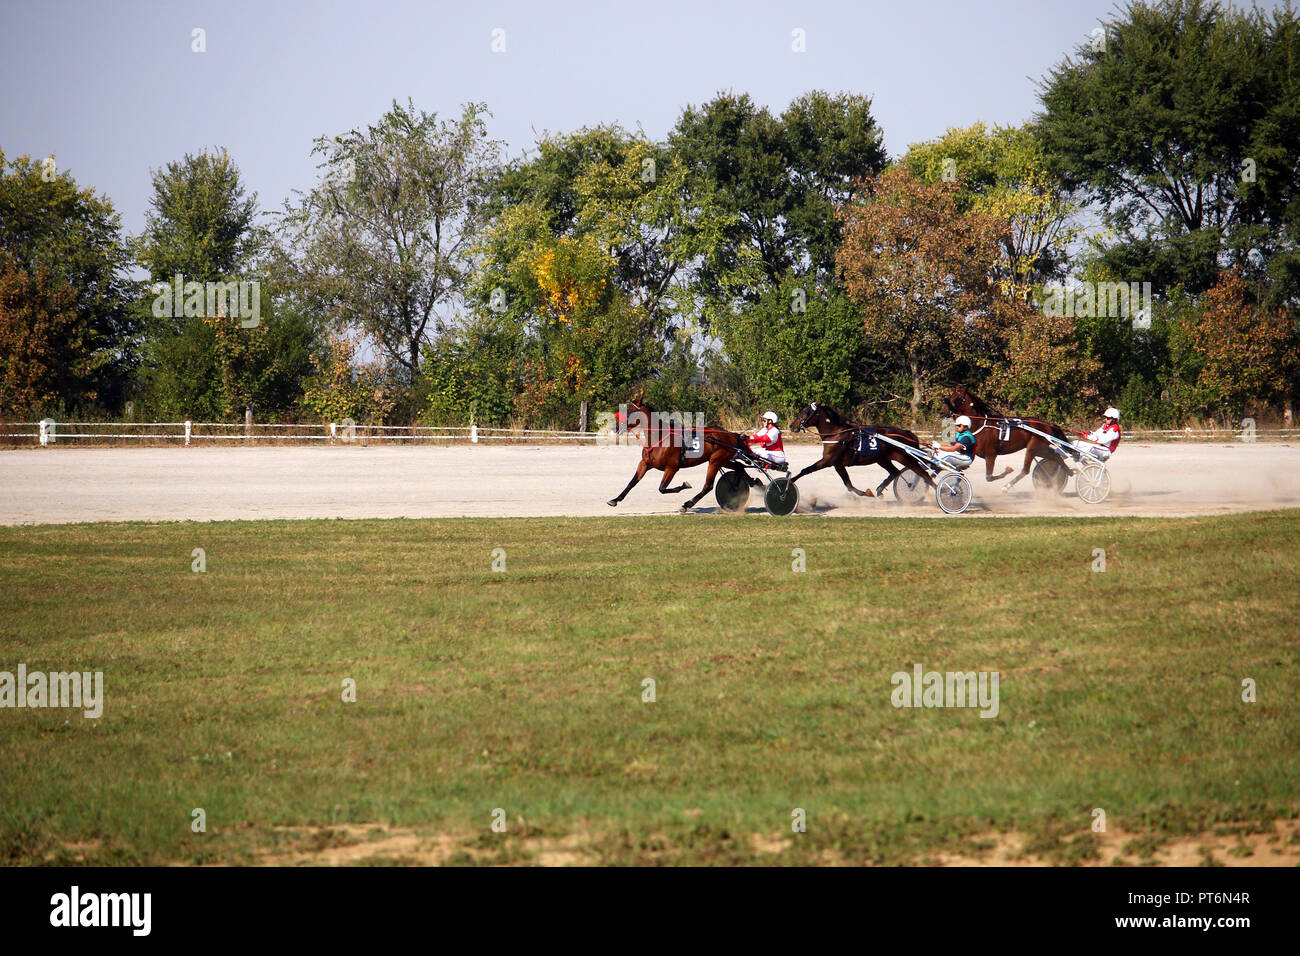 Trotting Race Harness Racing Track Stock Photos Amp Trotting